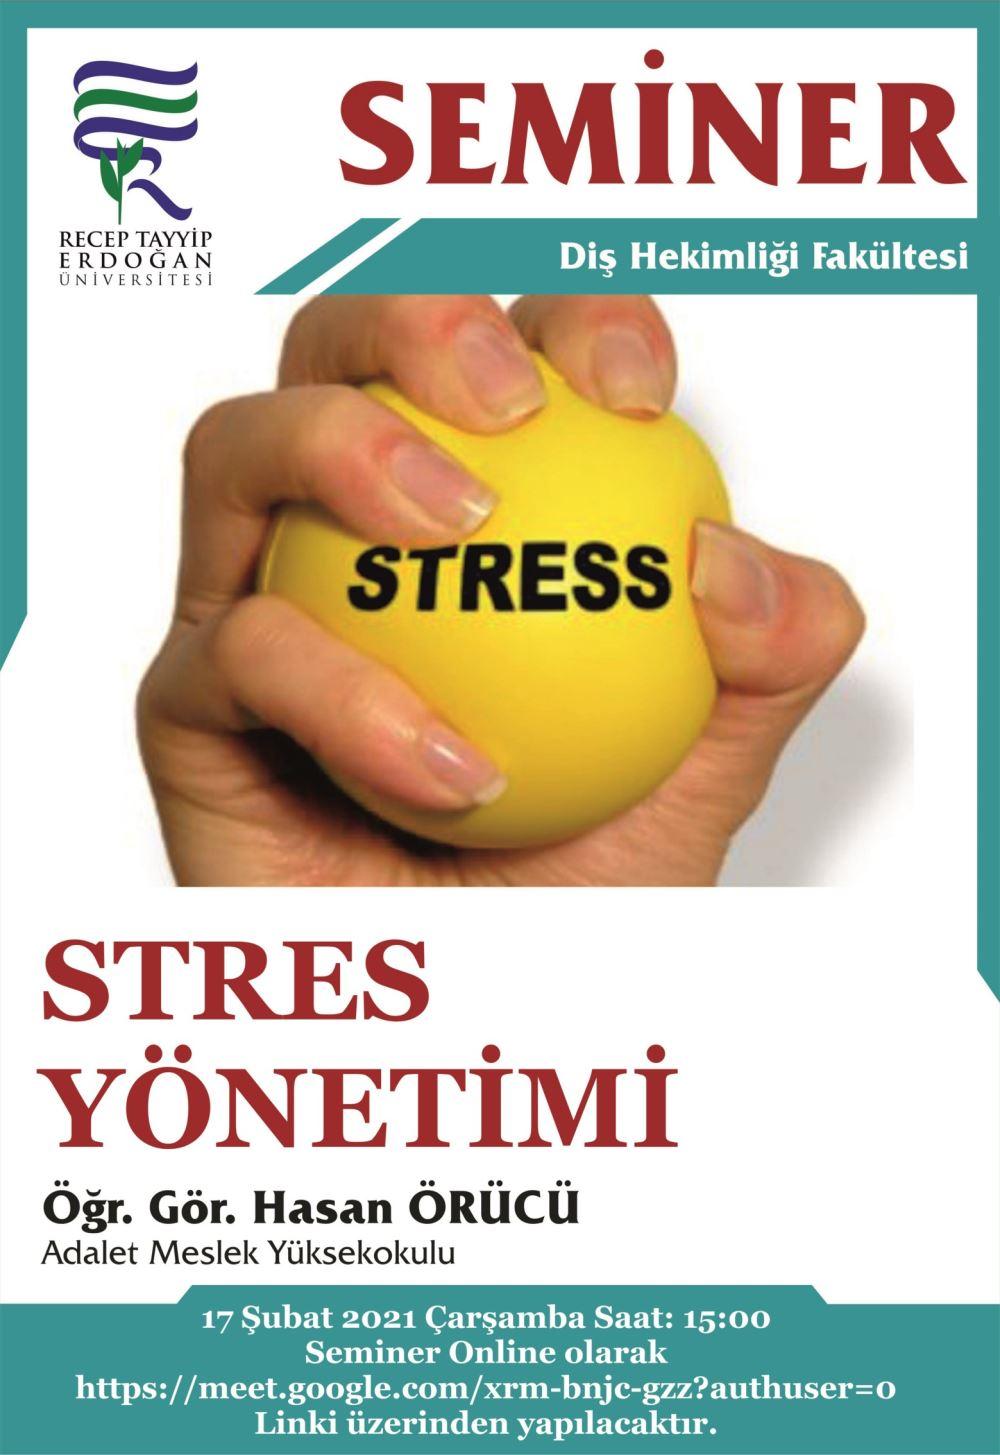 Seminer - Stres yönetimi